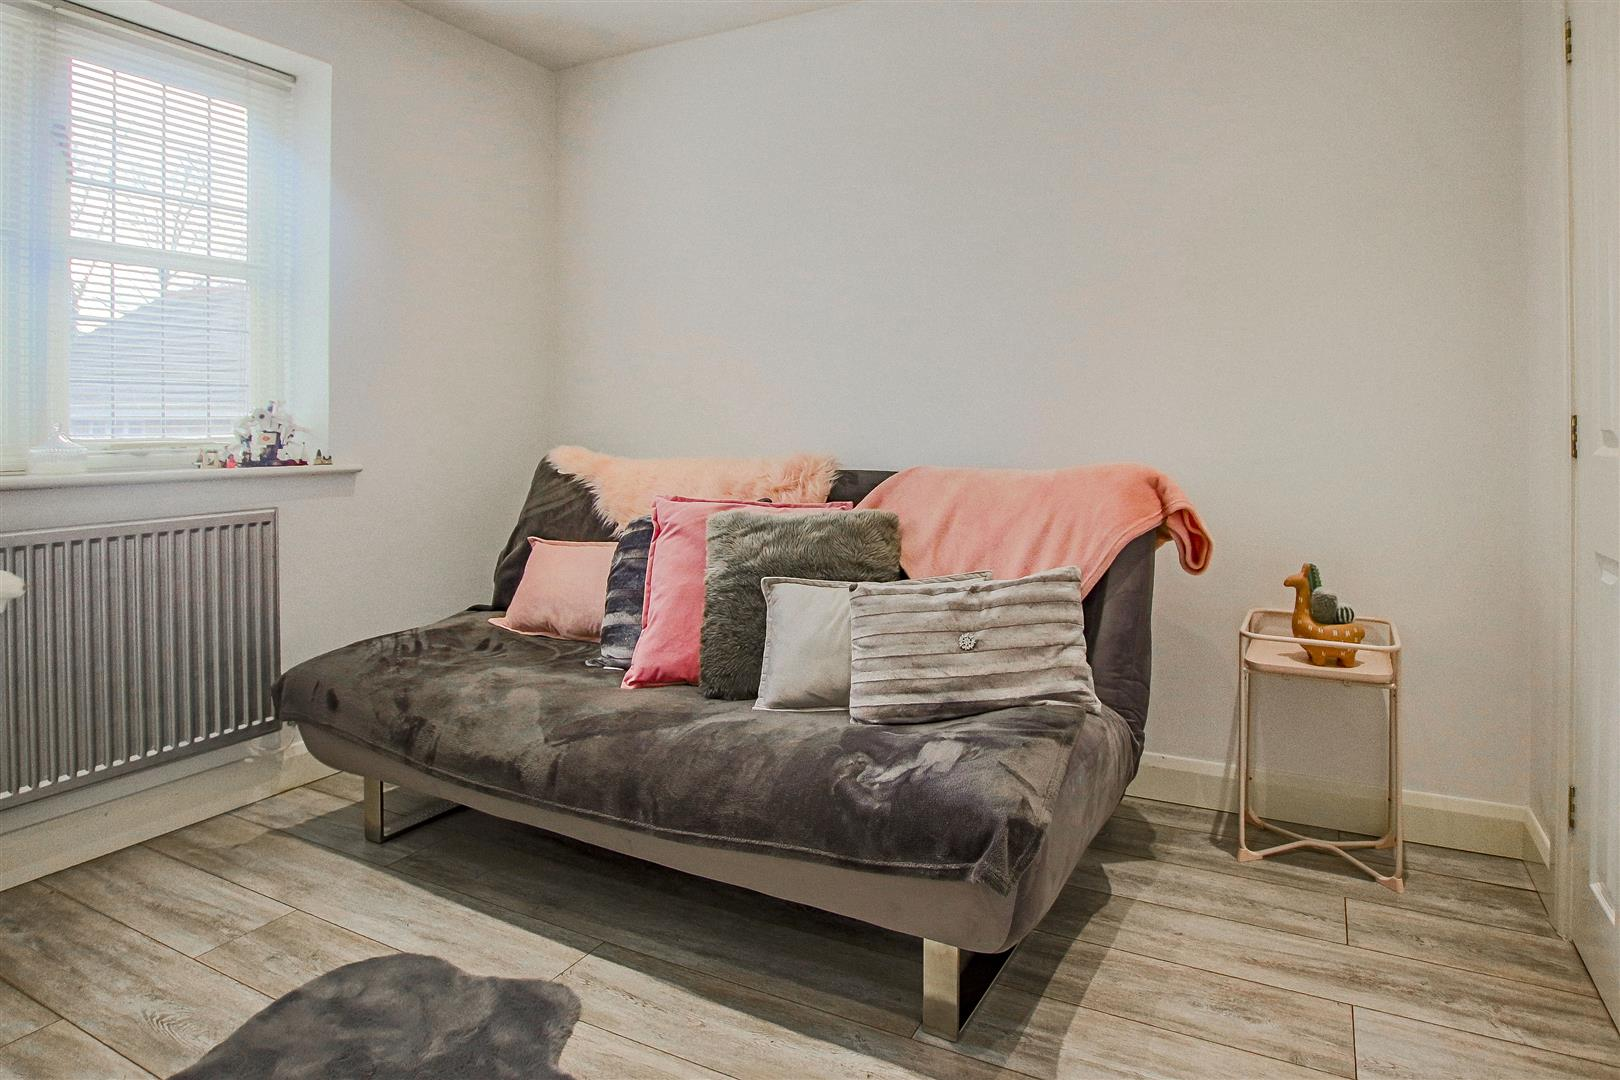 4 Bedroom Detached House For Sale - redwing31772.JPG